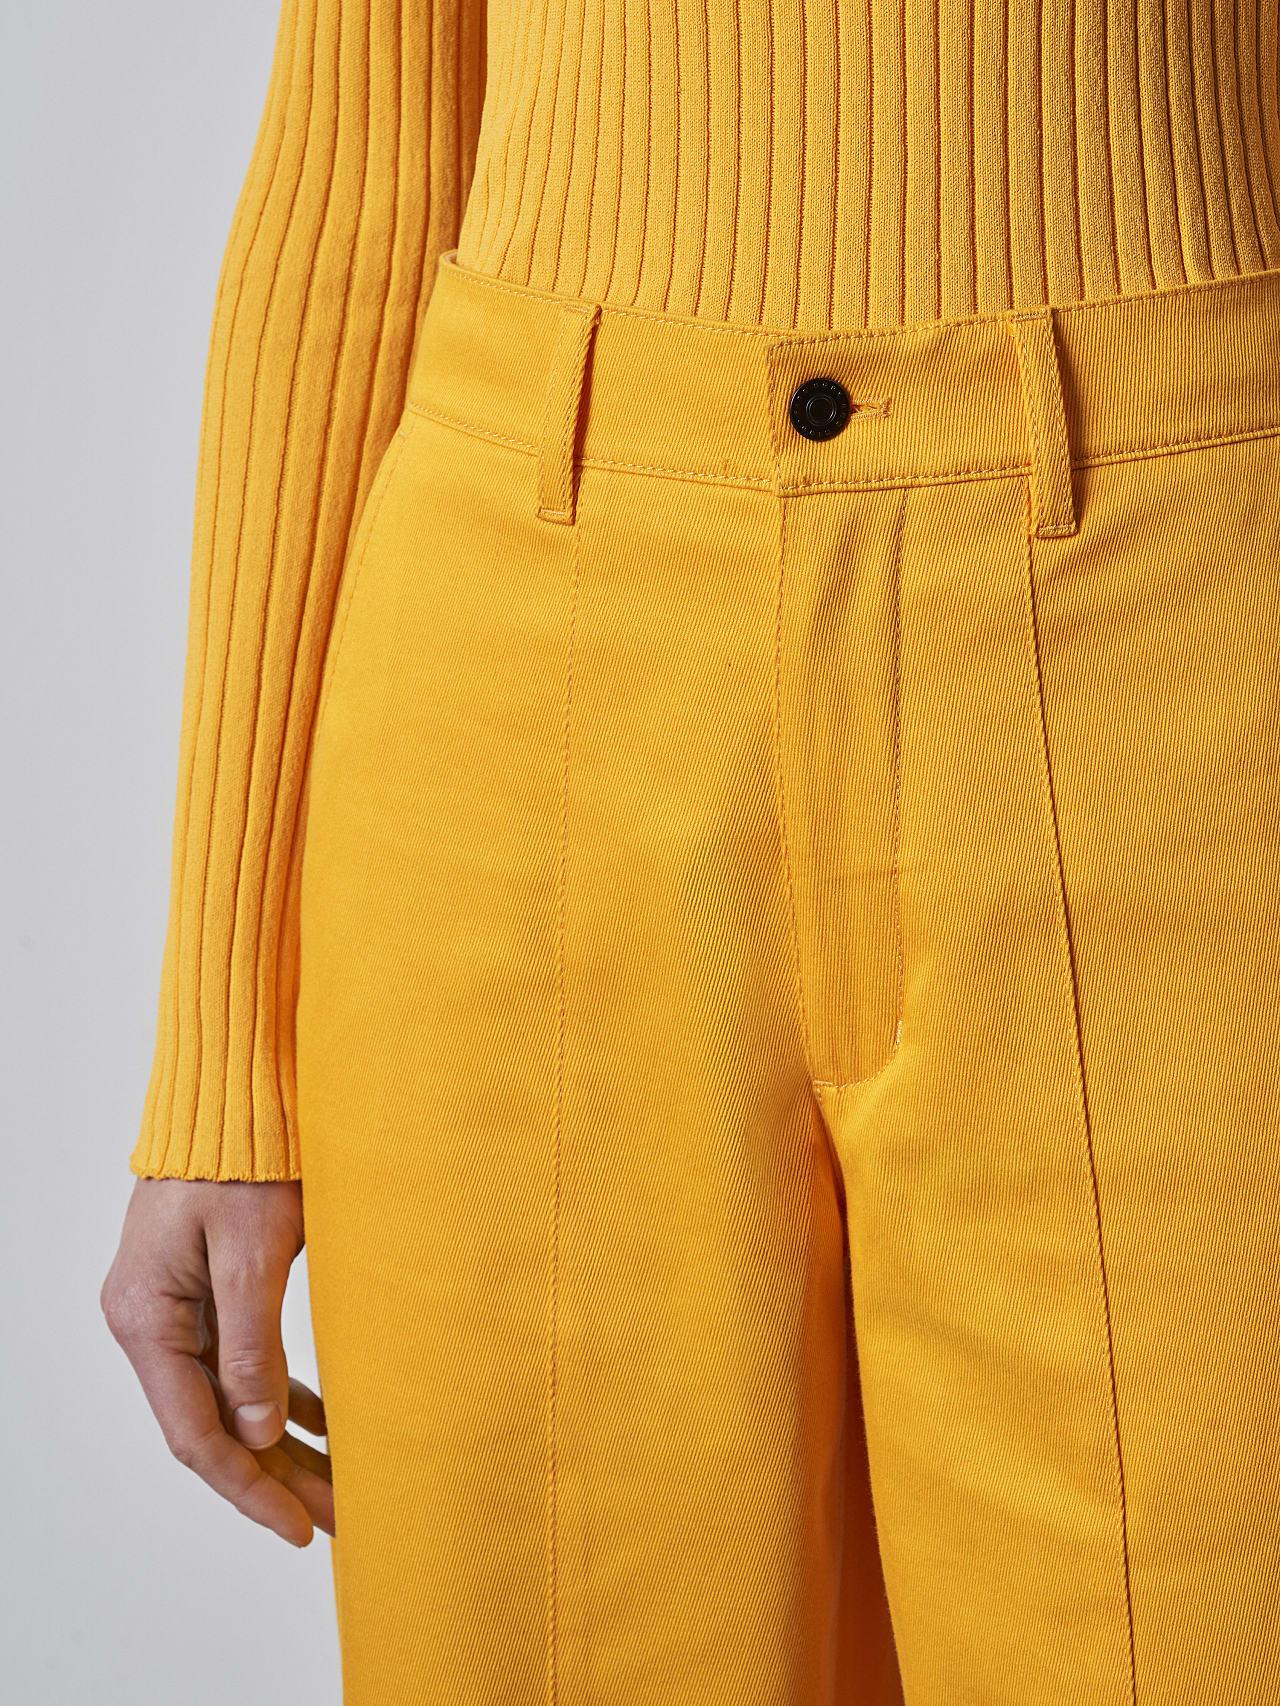 PCHAR V1.Y5.02 Tapered Barrel-Leg Pants yellow Right Alpha Tauri